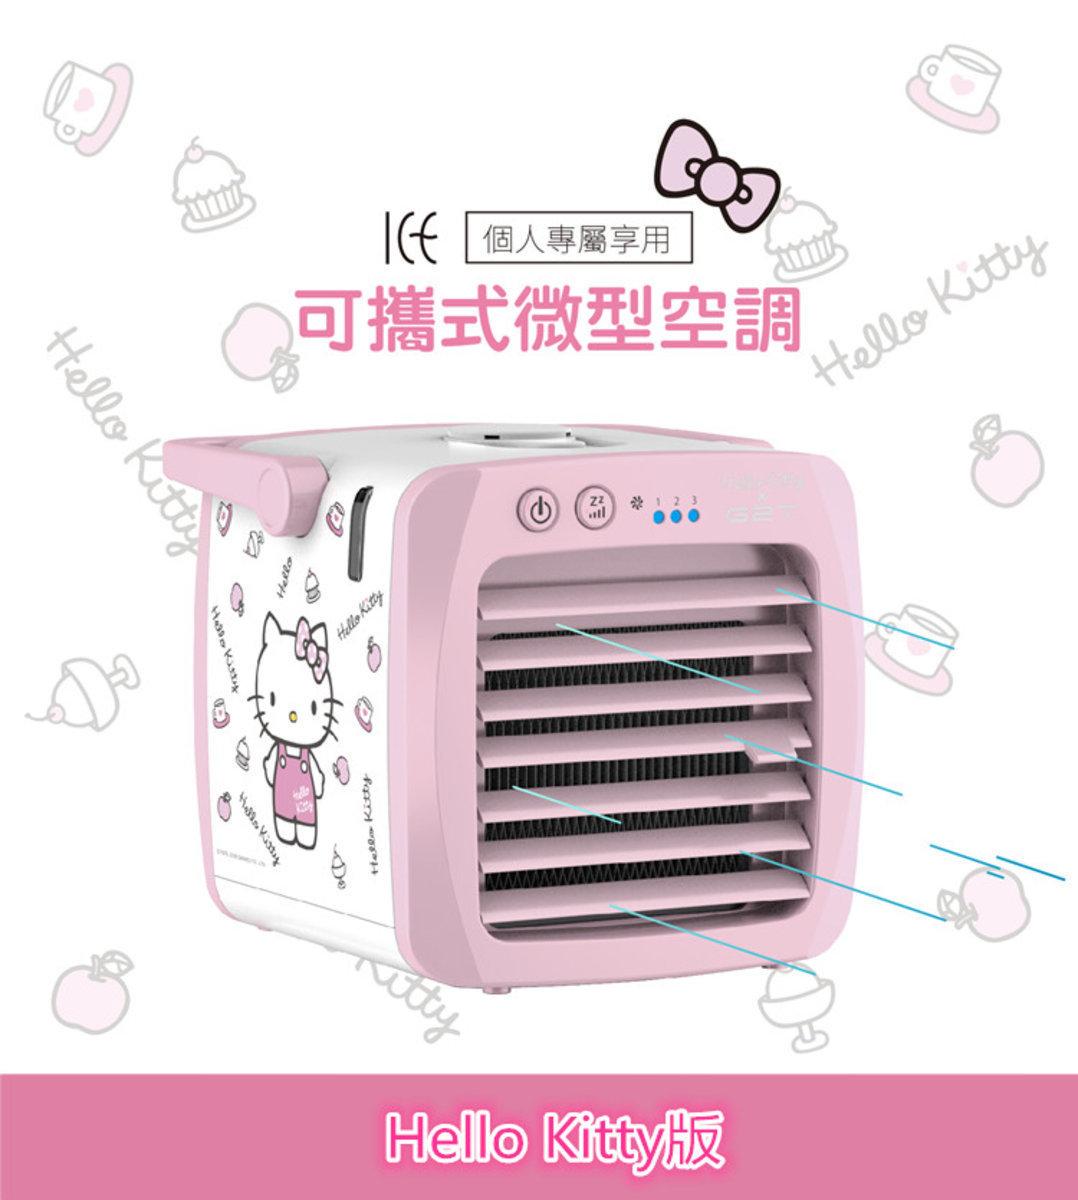 ICE Hello Kitty 特別版可攜式負離子微型冷氣機 (香港行貨)